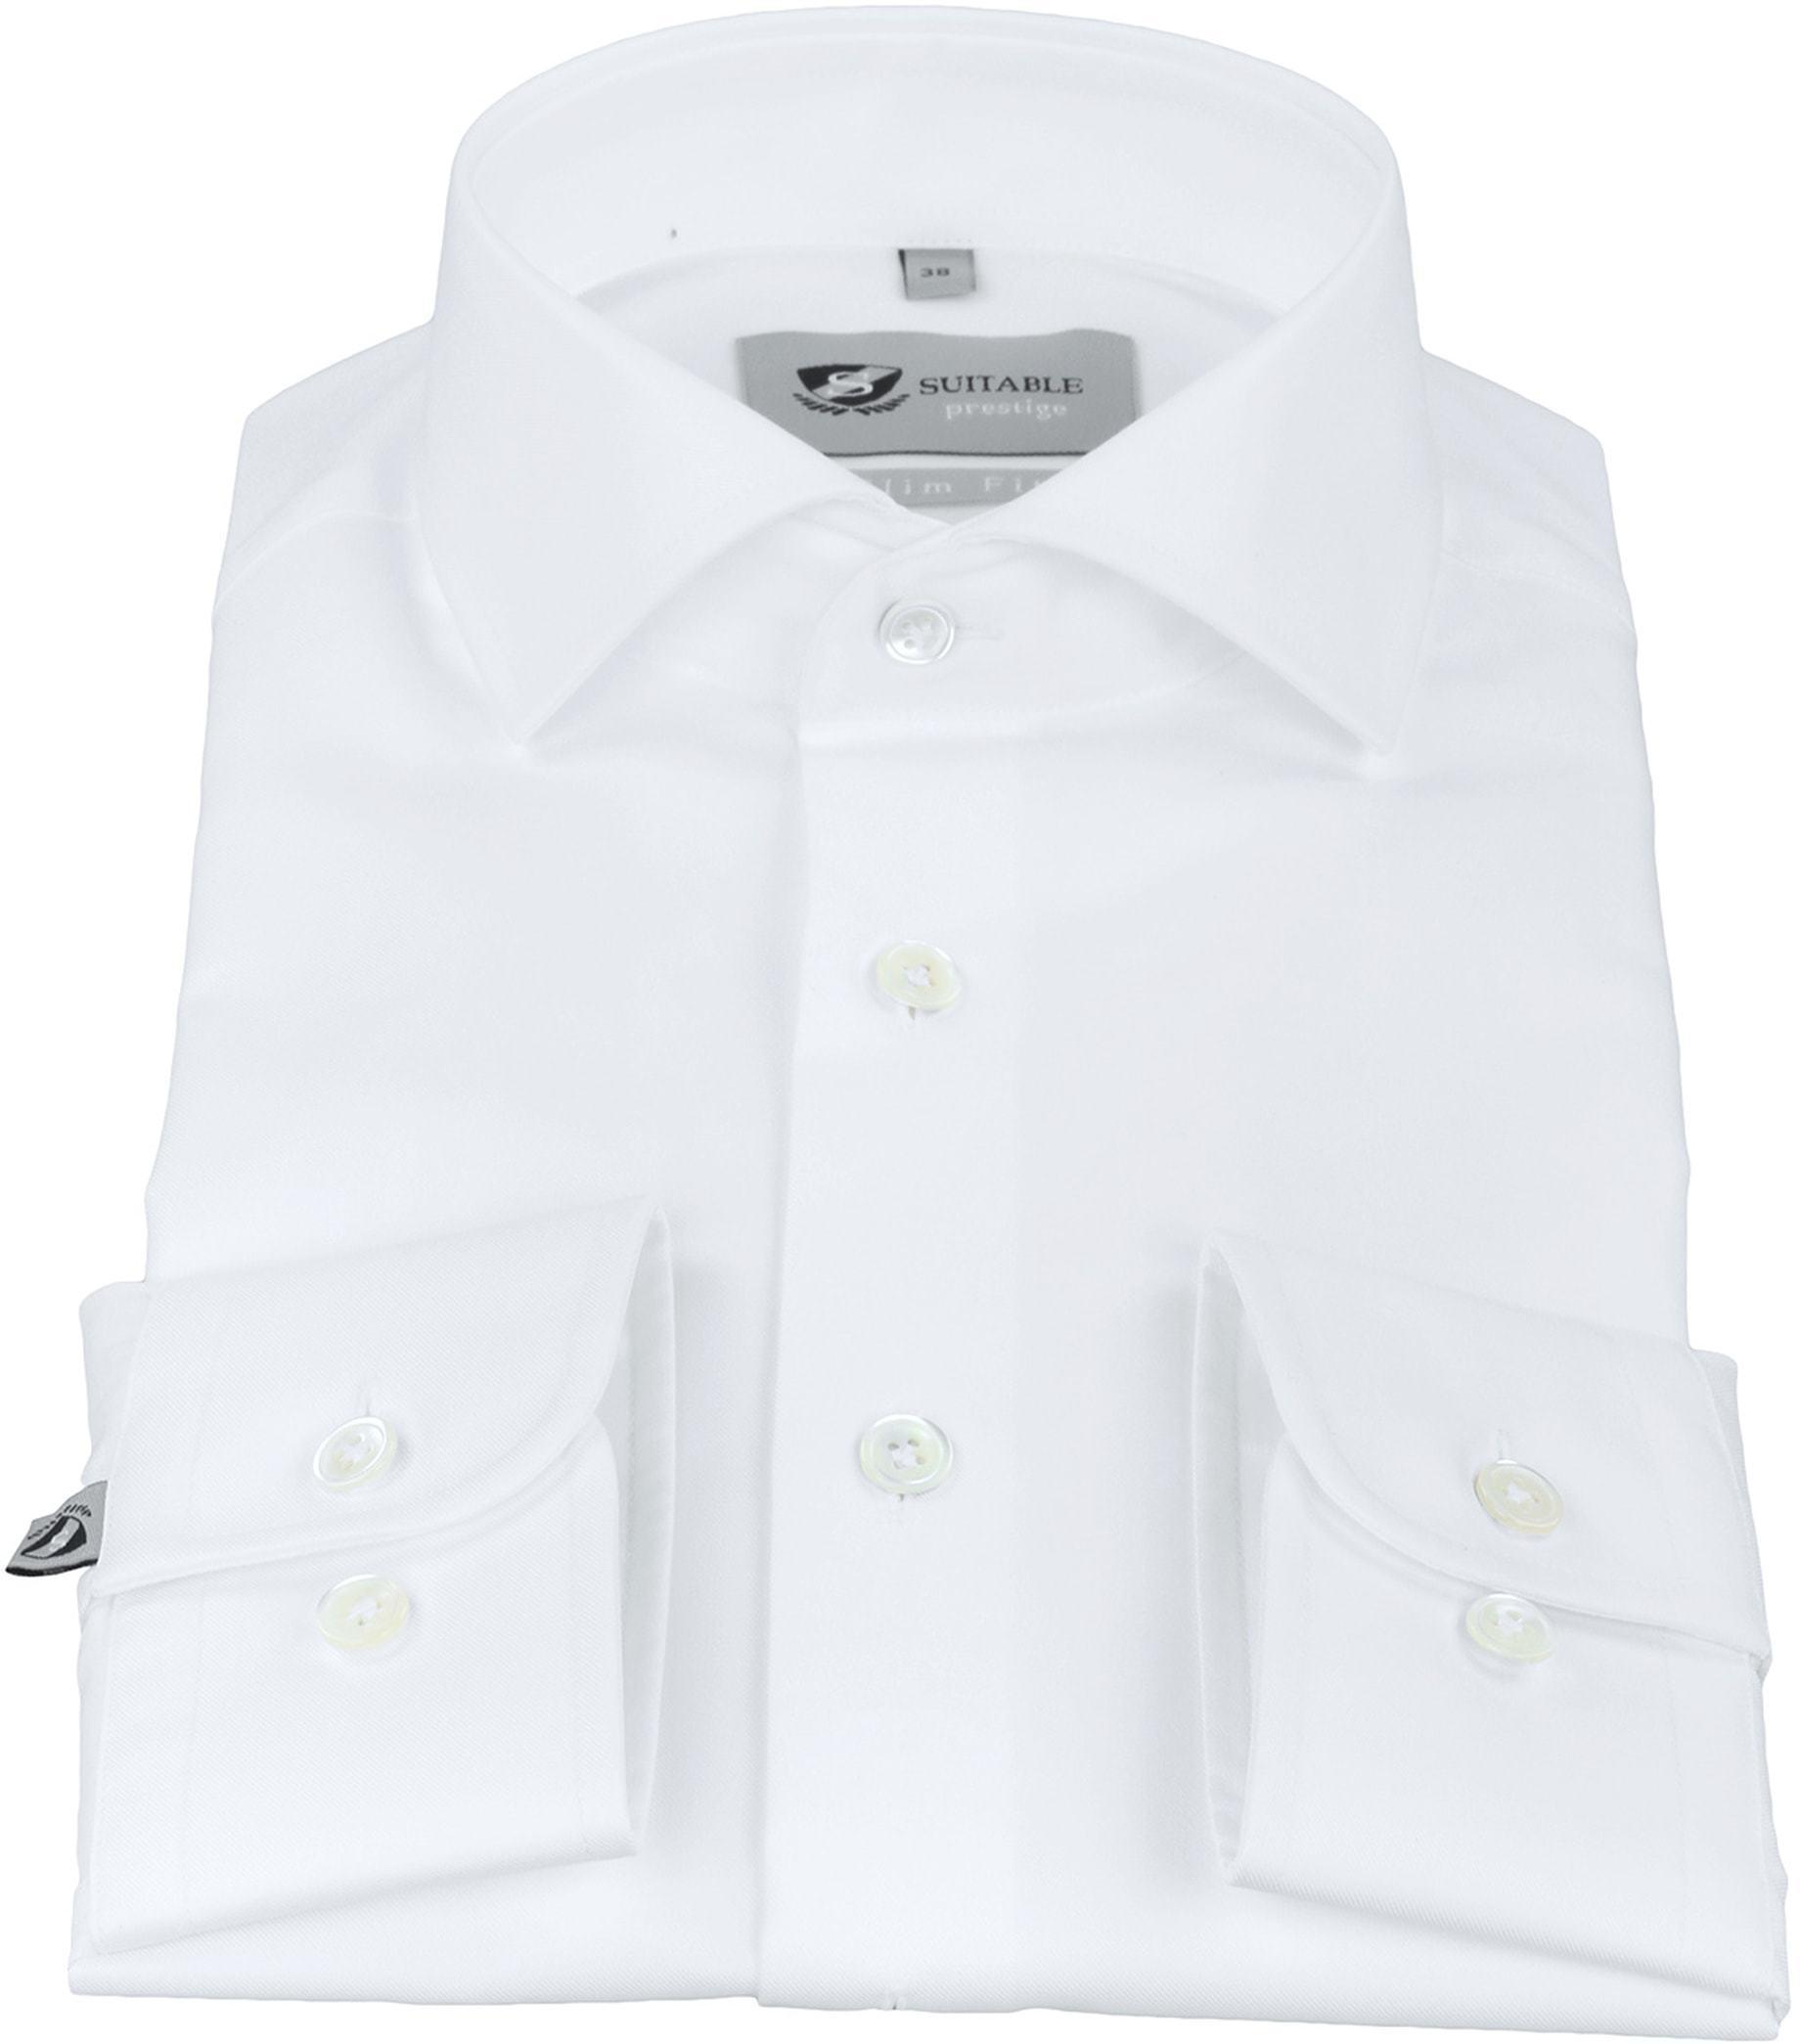 Suitable Hemd Prestige Albini Weiß foto 1